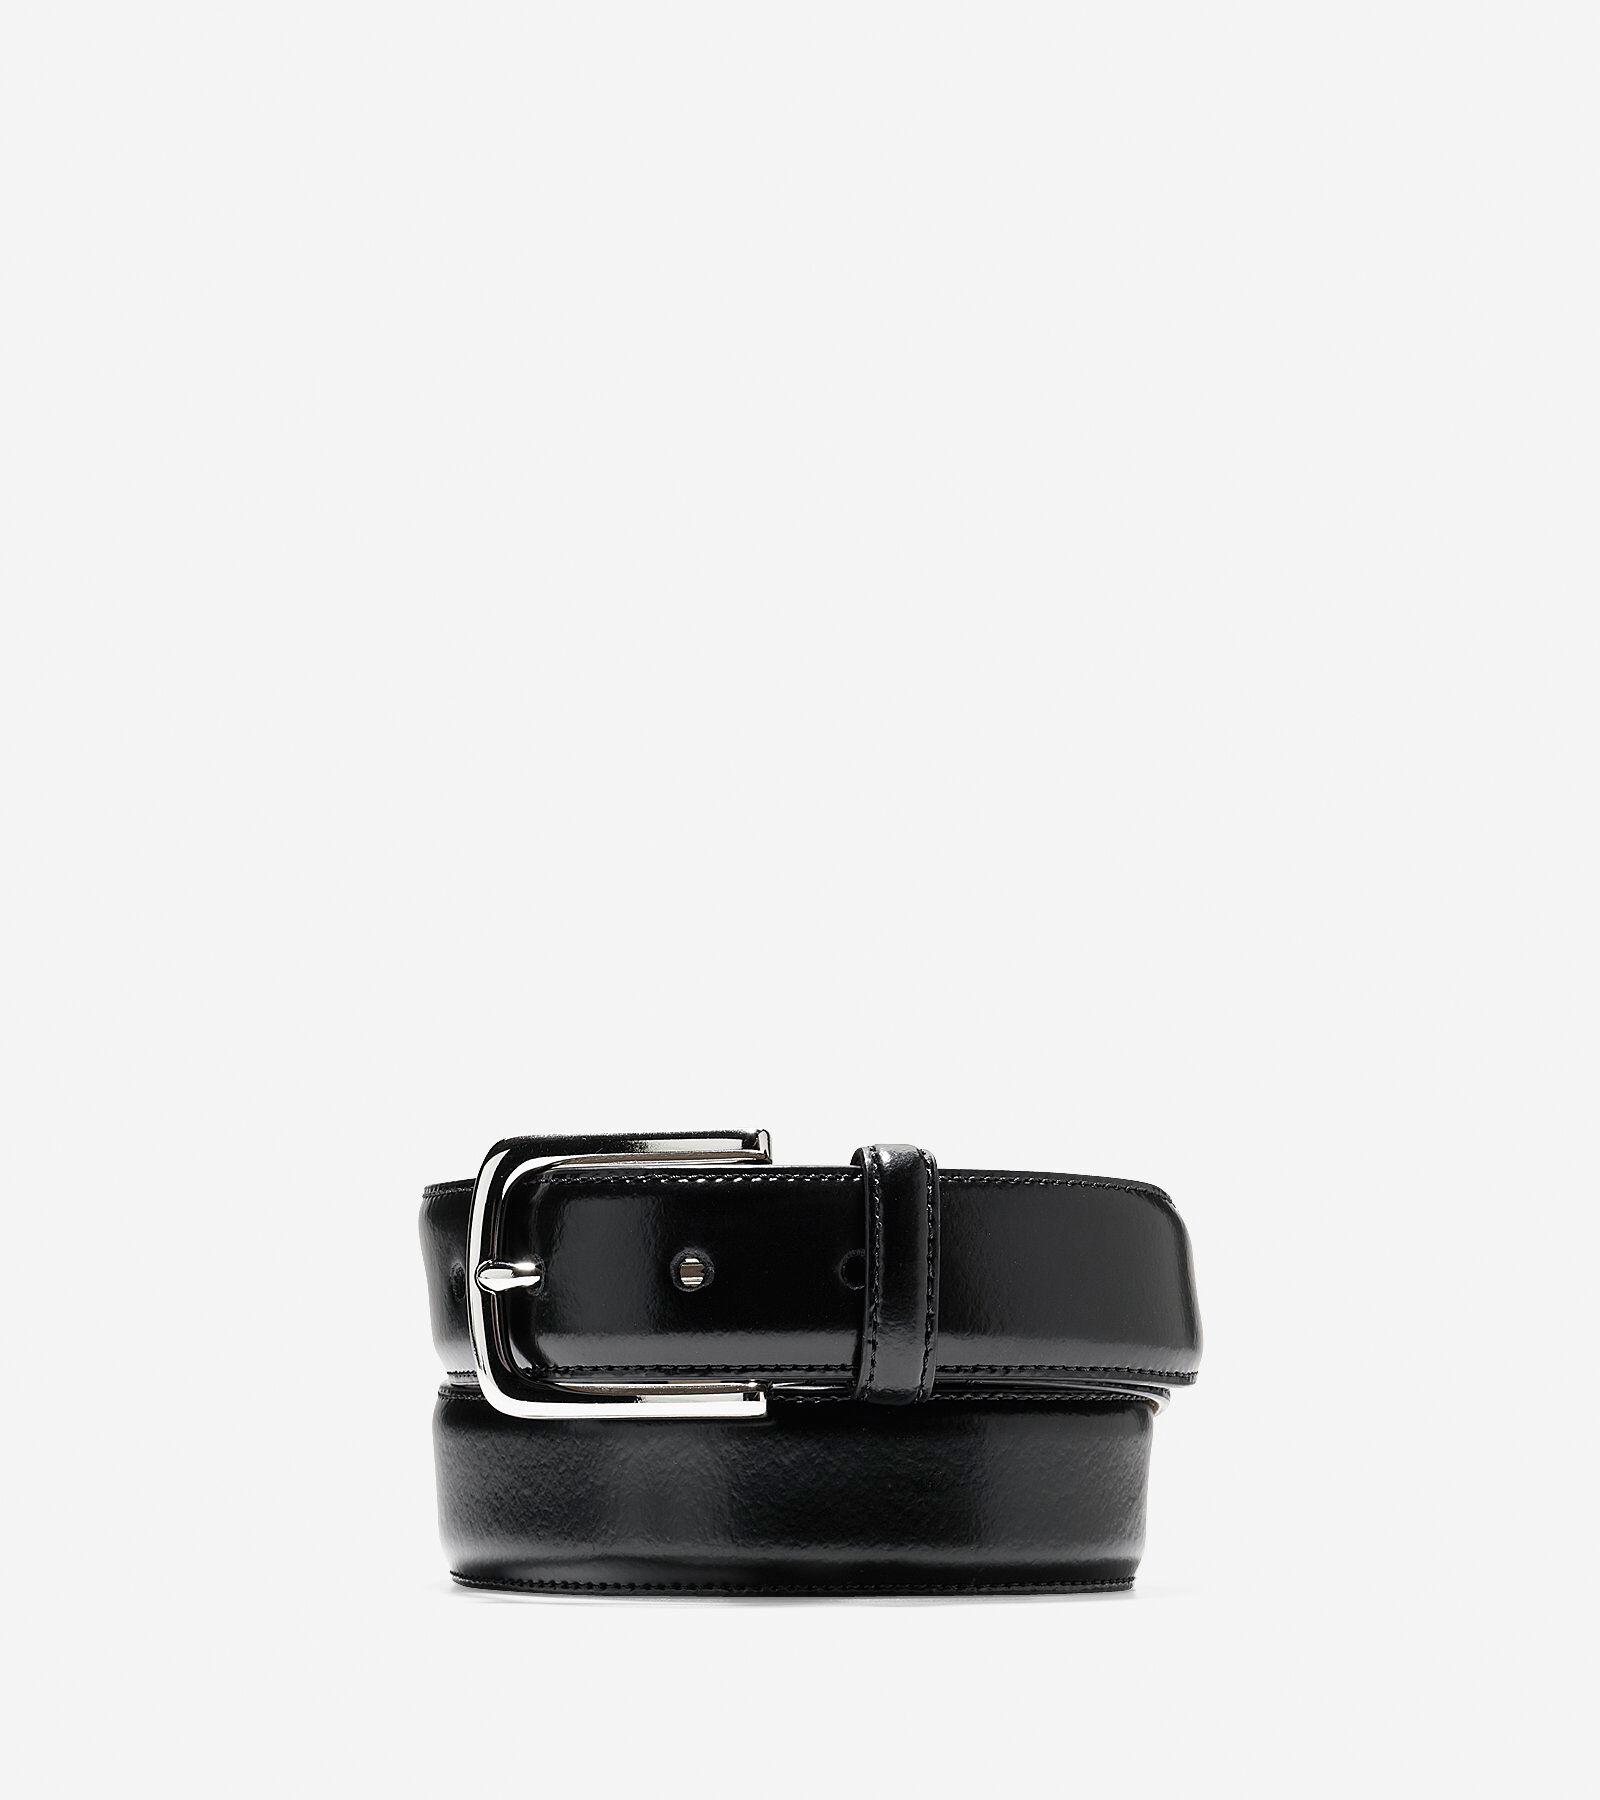 Cheap dress belts to reduce